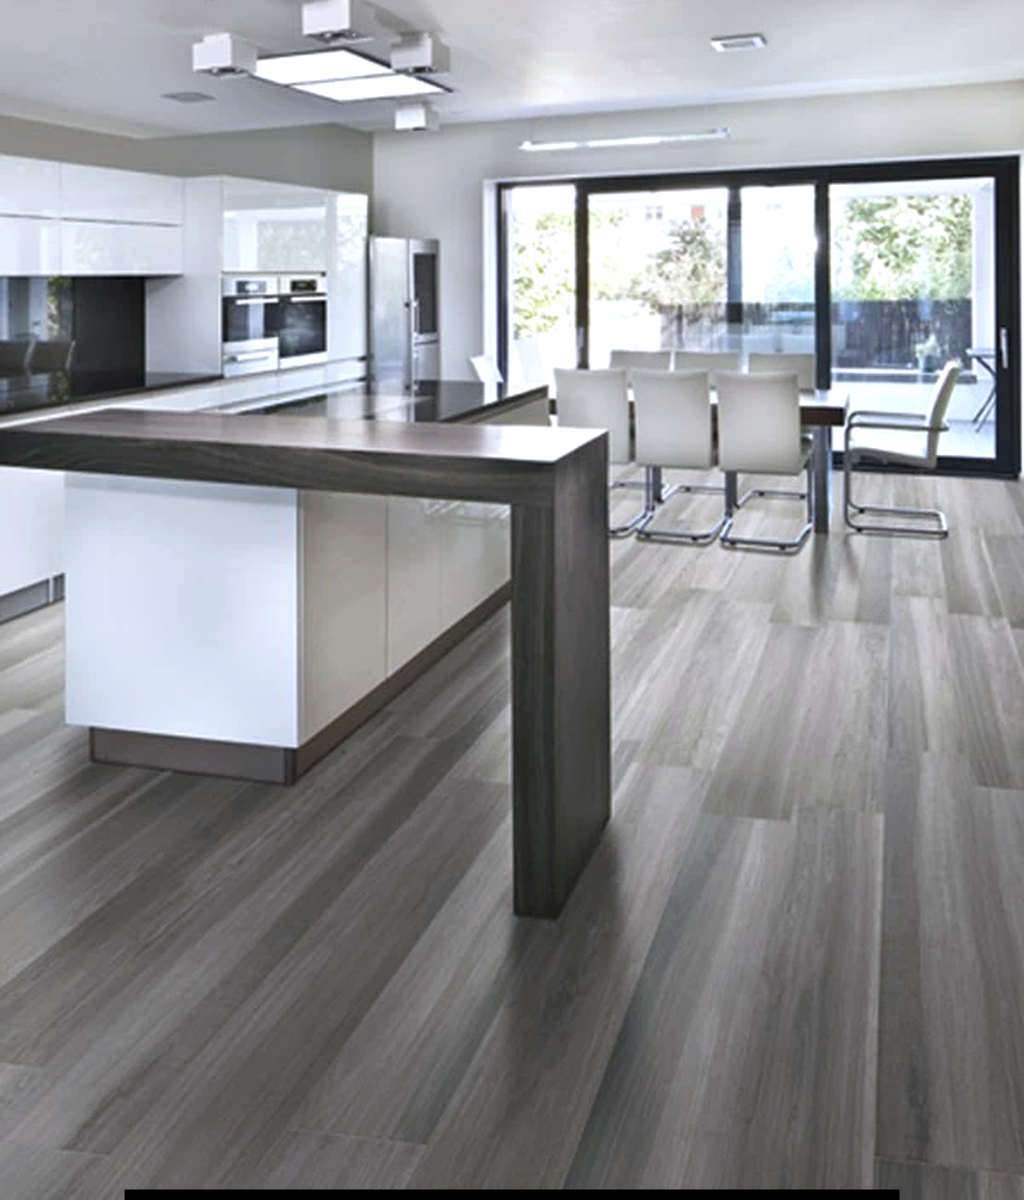 Admirable Luxury Kitchen Design Ideas You Will Love 06